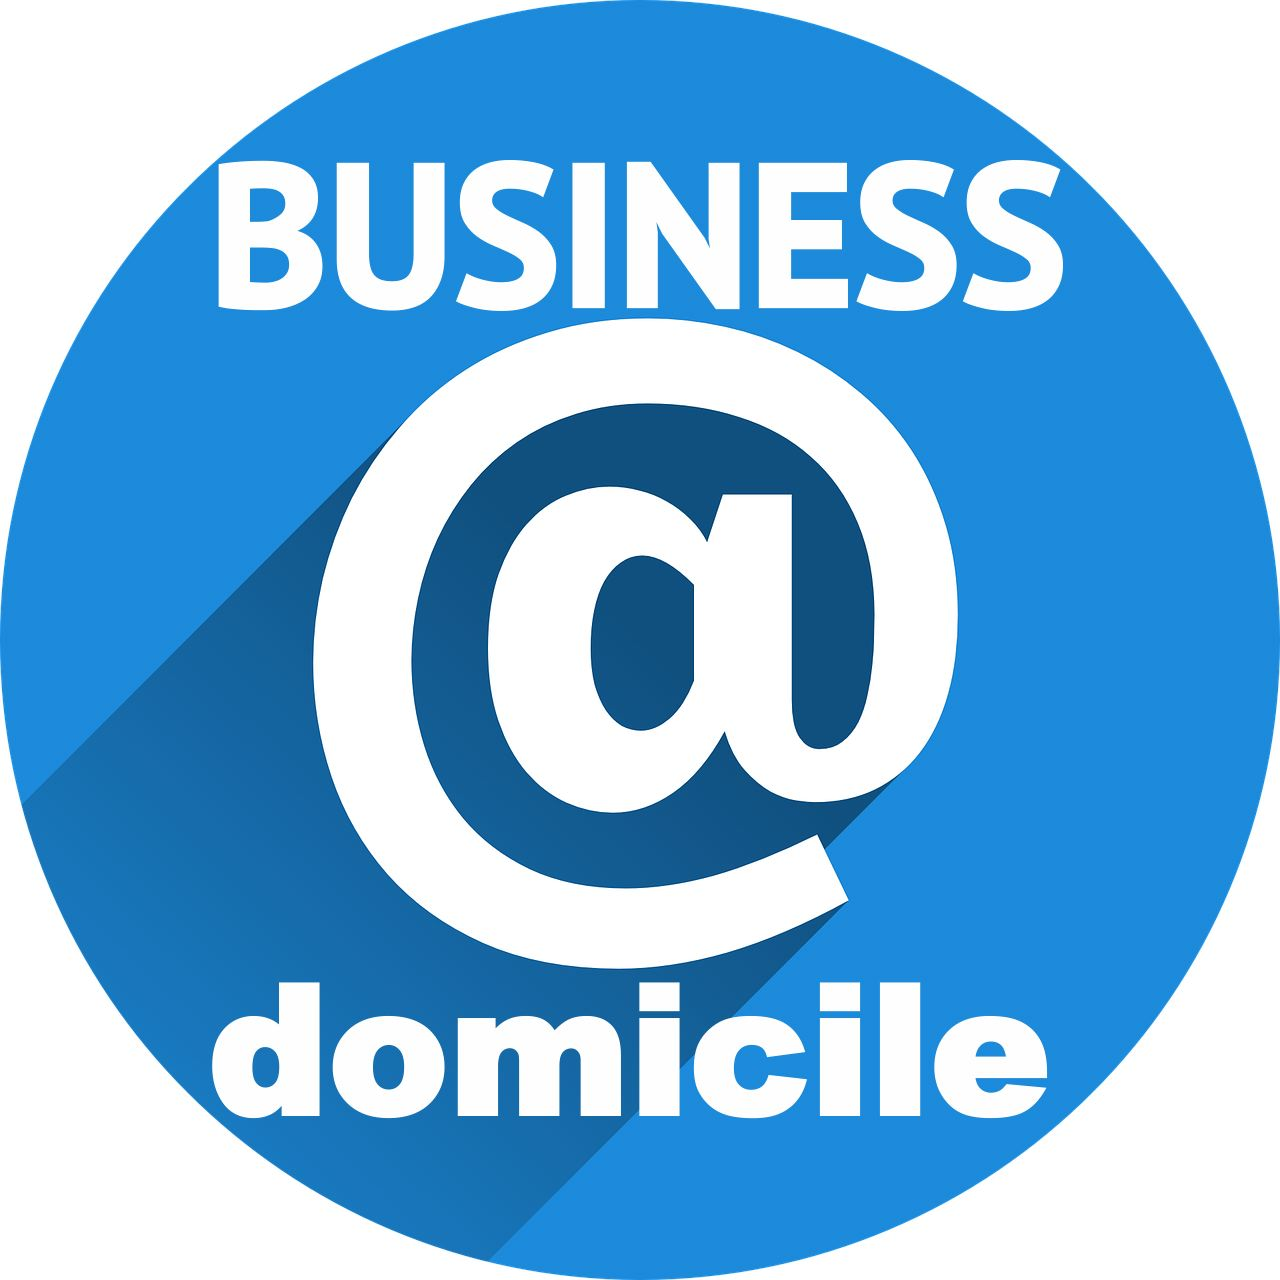 Business @ domicile